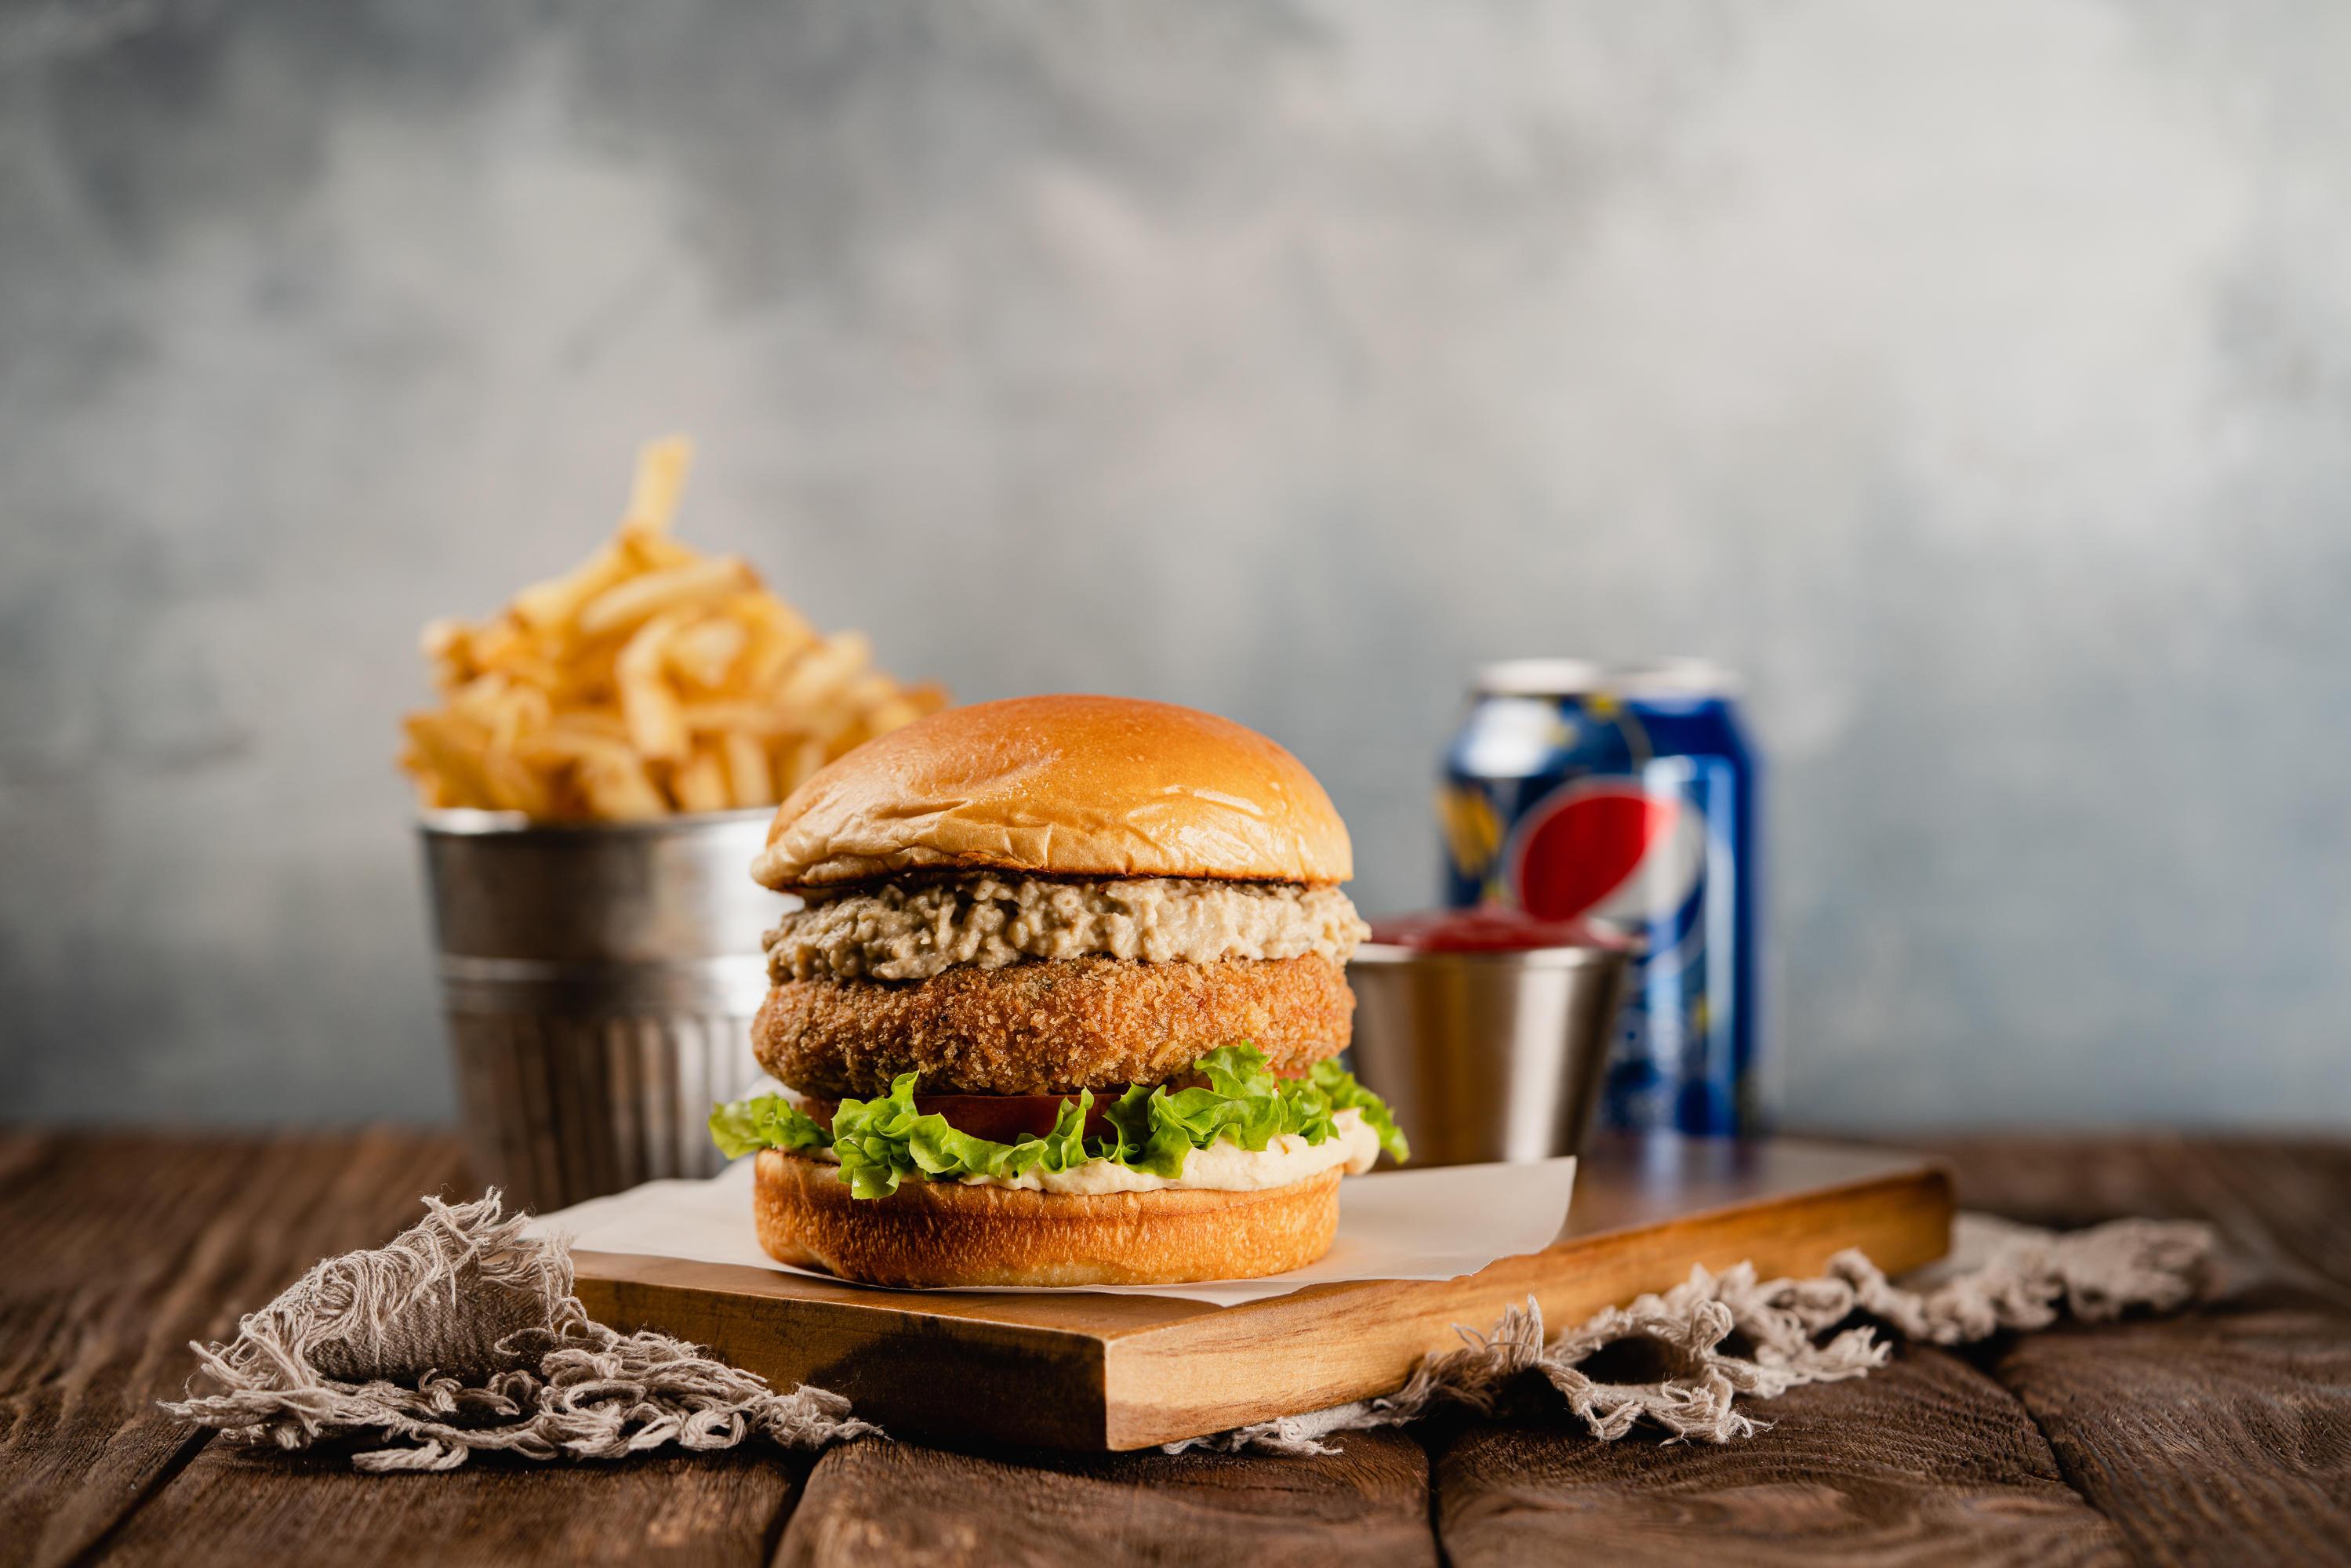 The Burger Fix - ذا برجر فيكس - Gate Avenue